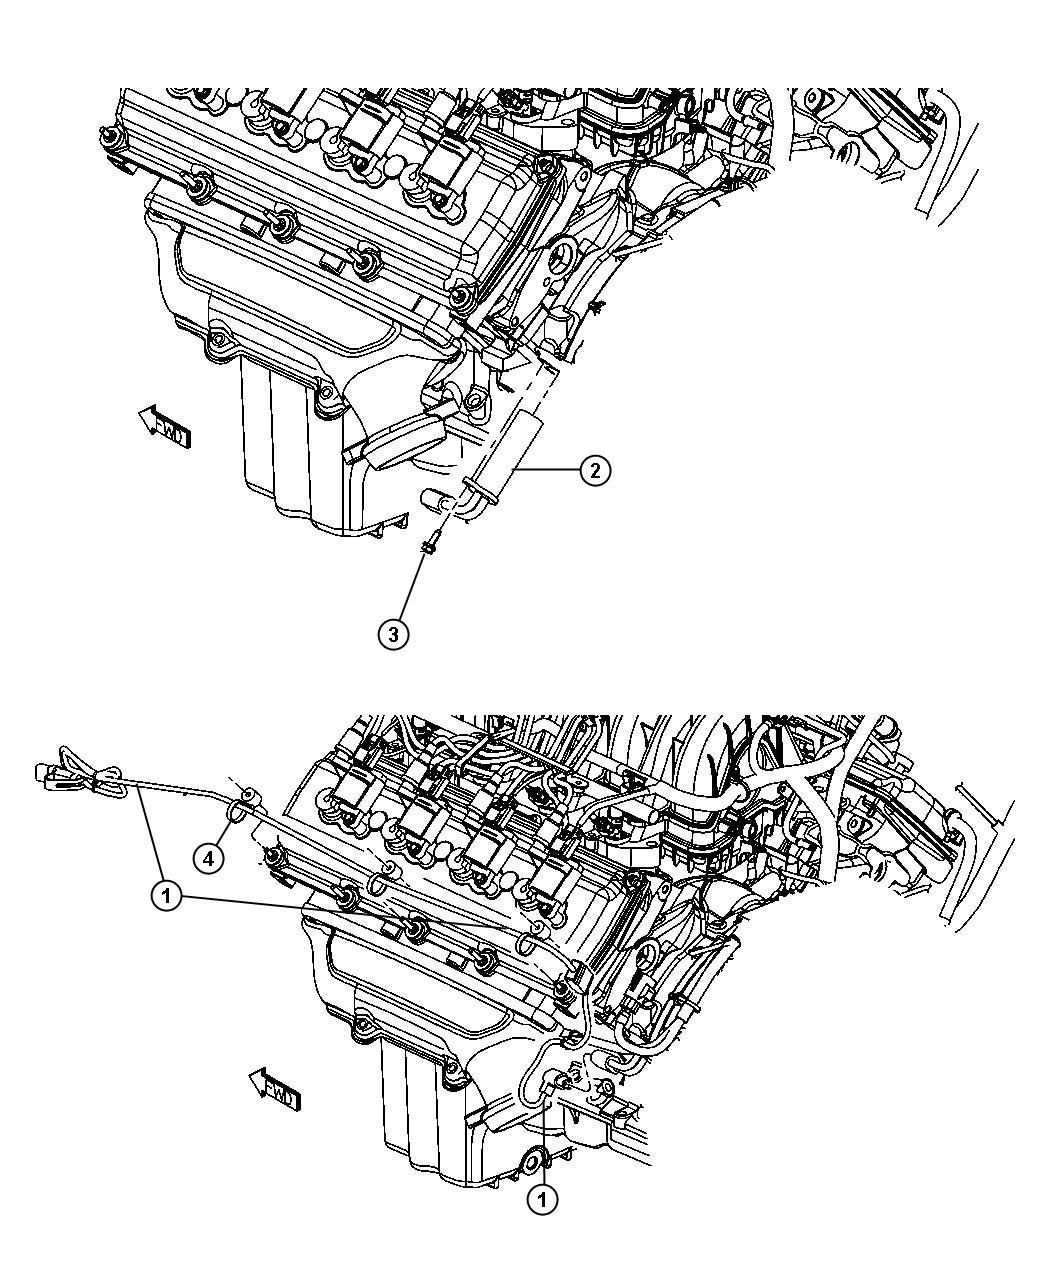 Dodge Magnum Engine Cylinder Block Heater 5.7L [5.7L Hemi